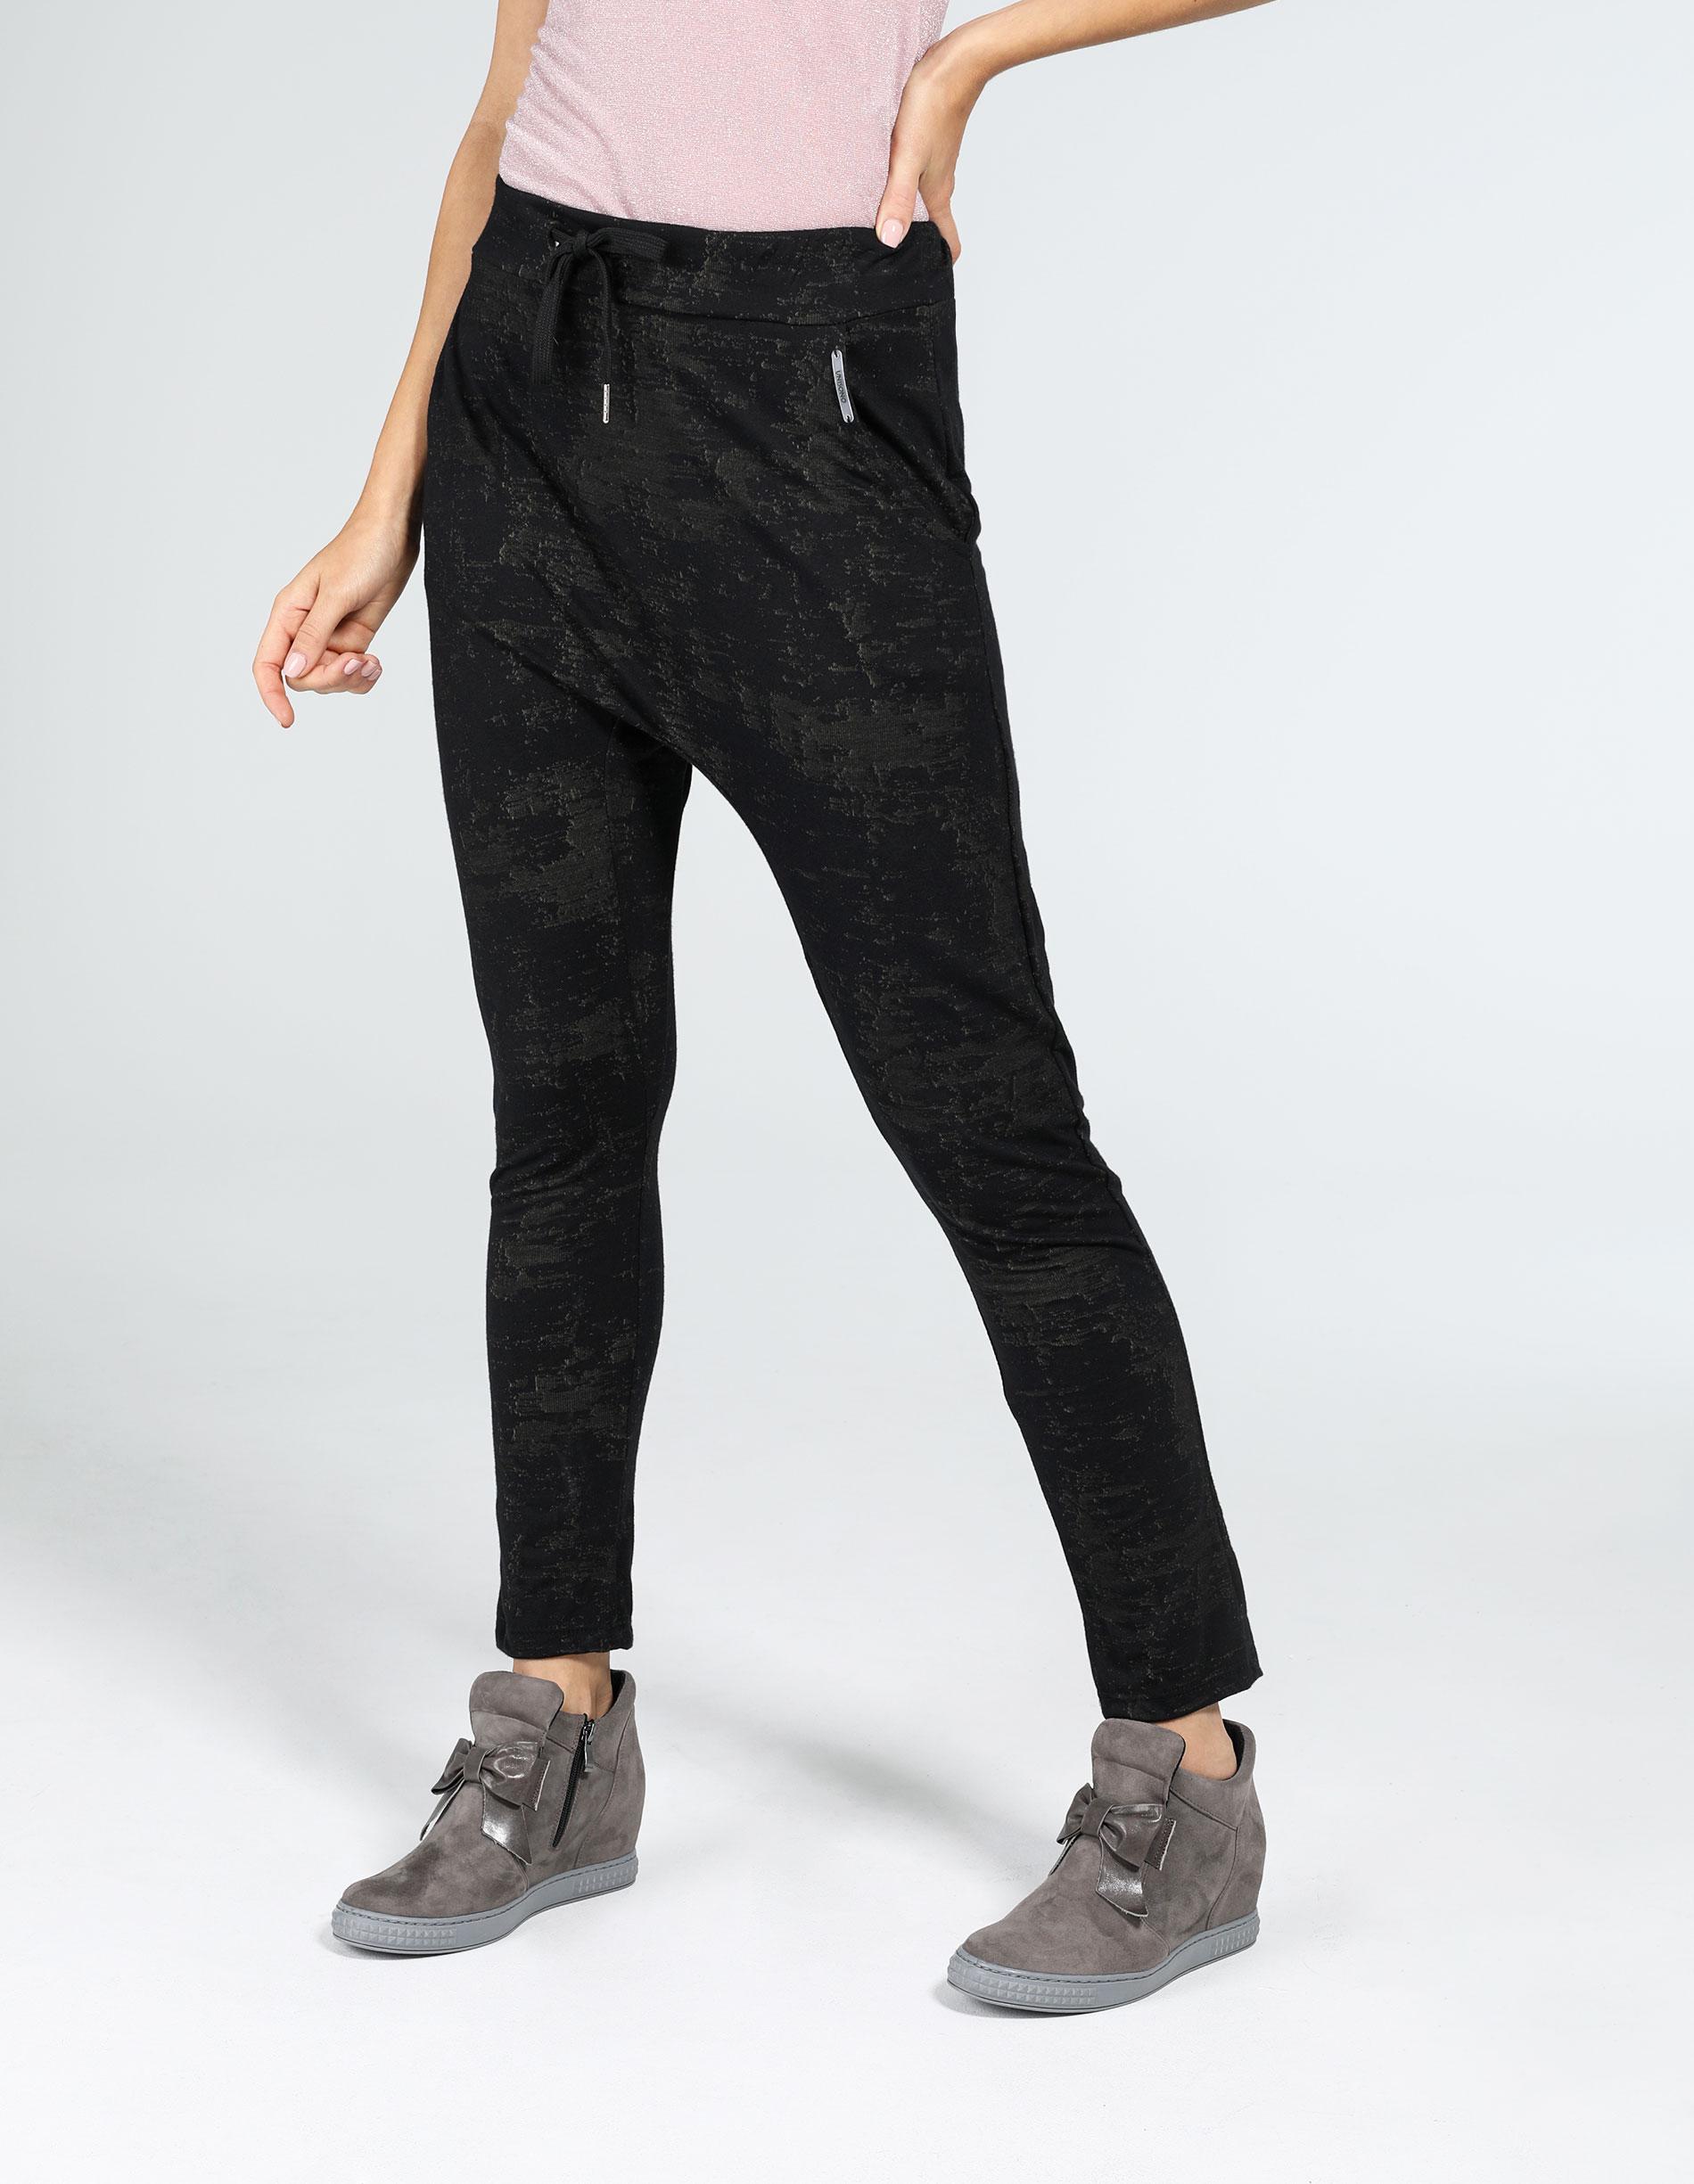 Spodnie - 30-64163VA NE - Unisono